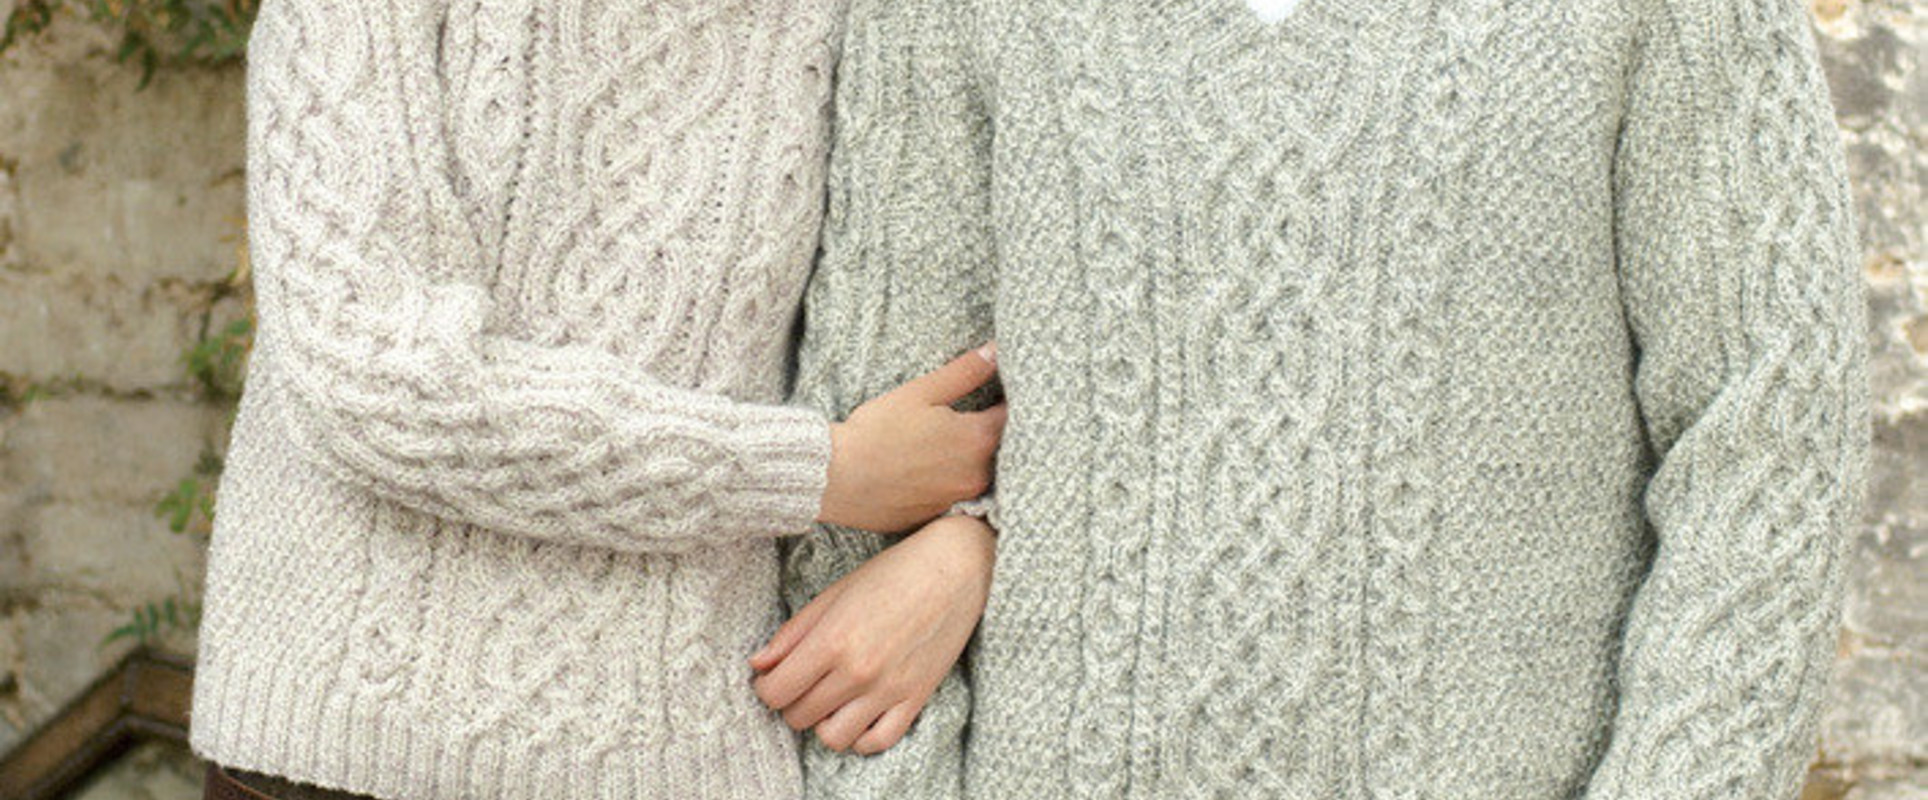 b897737ed860 Top 5 Free Aran Jumper Knitting Patterns for Men